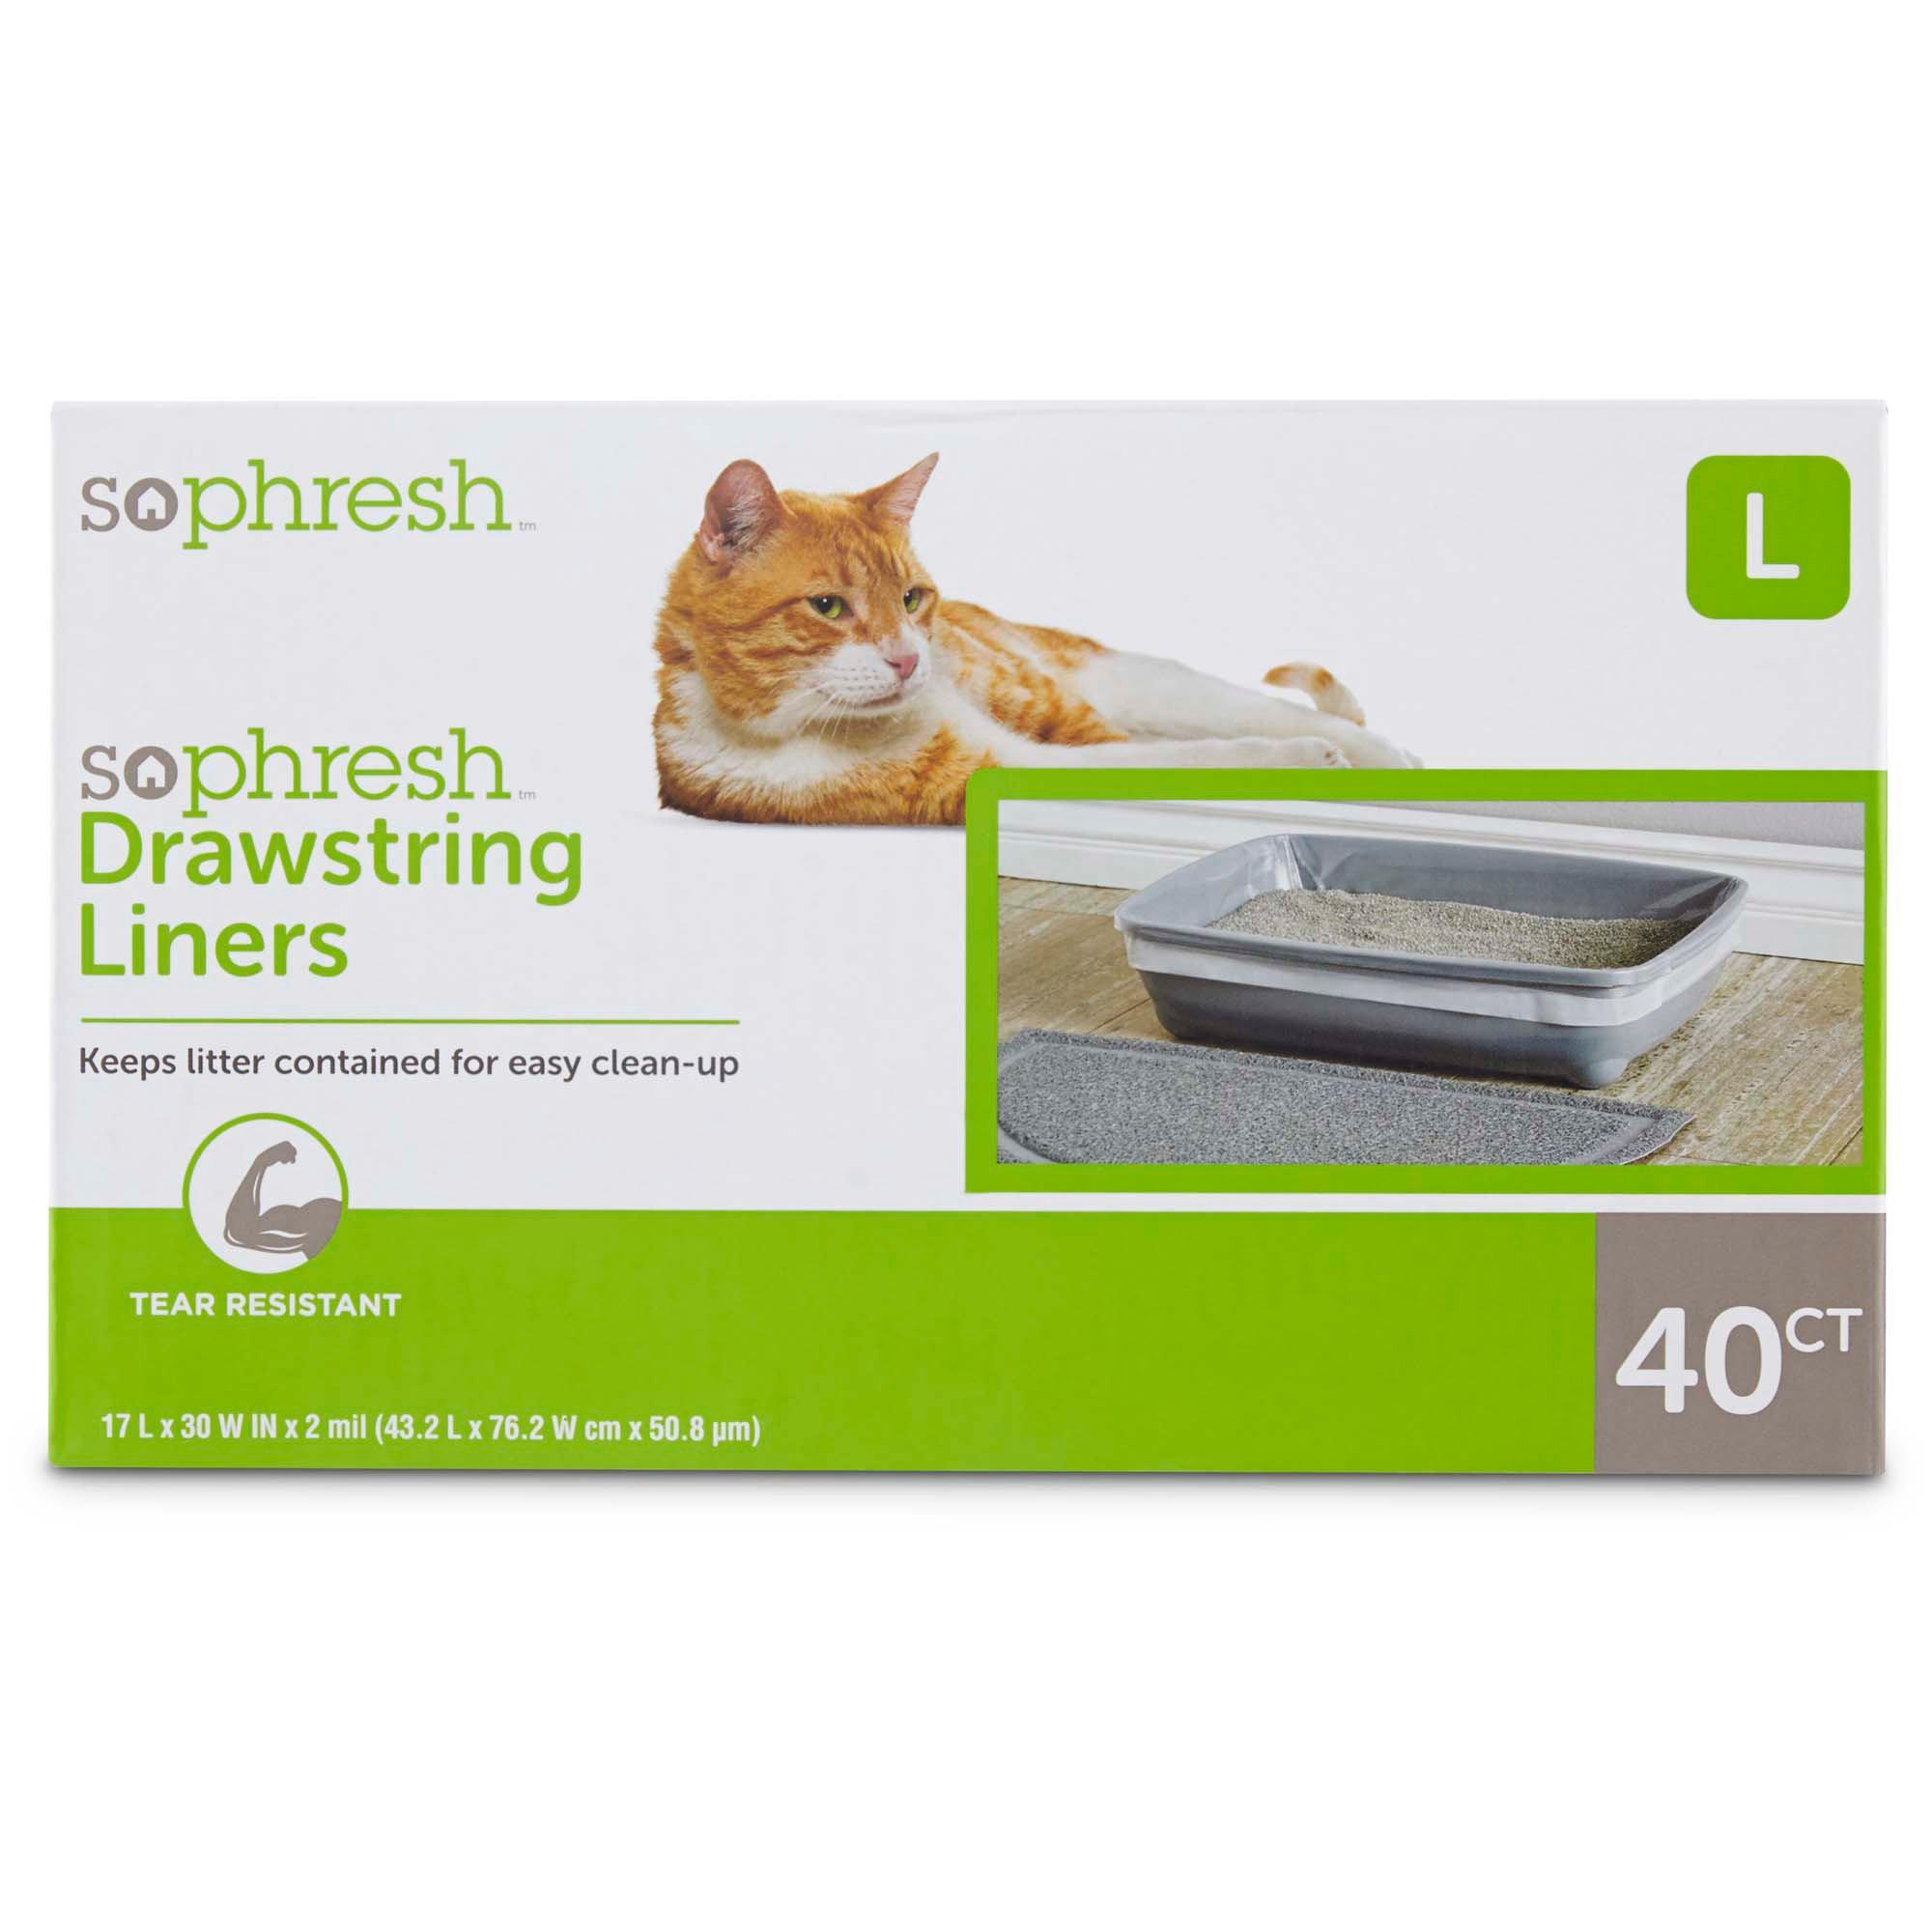 So Phresh Drawstring Cat Litter Box Liners | Petco